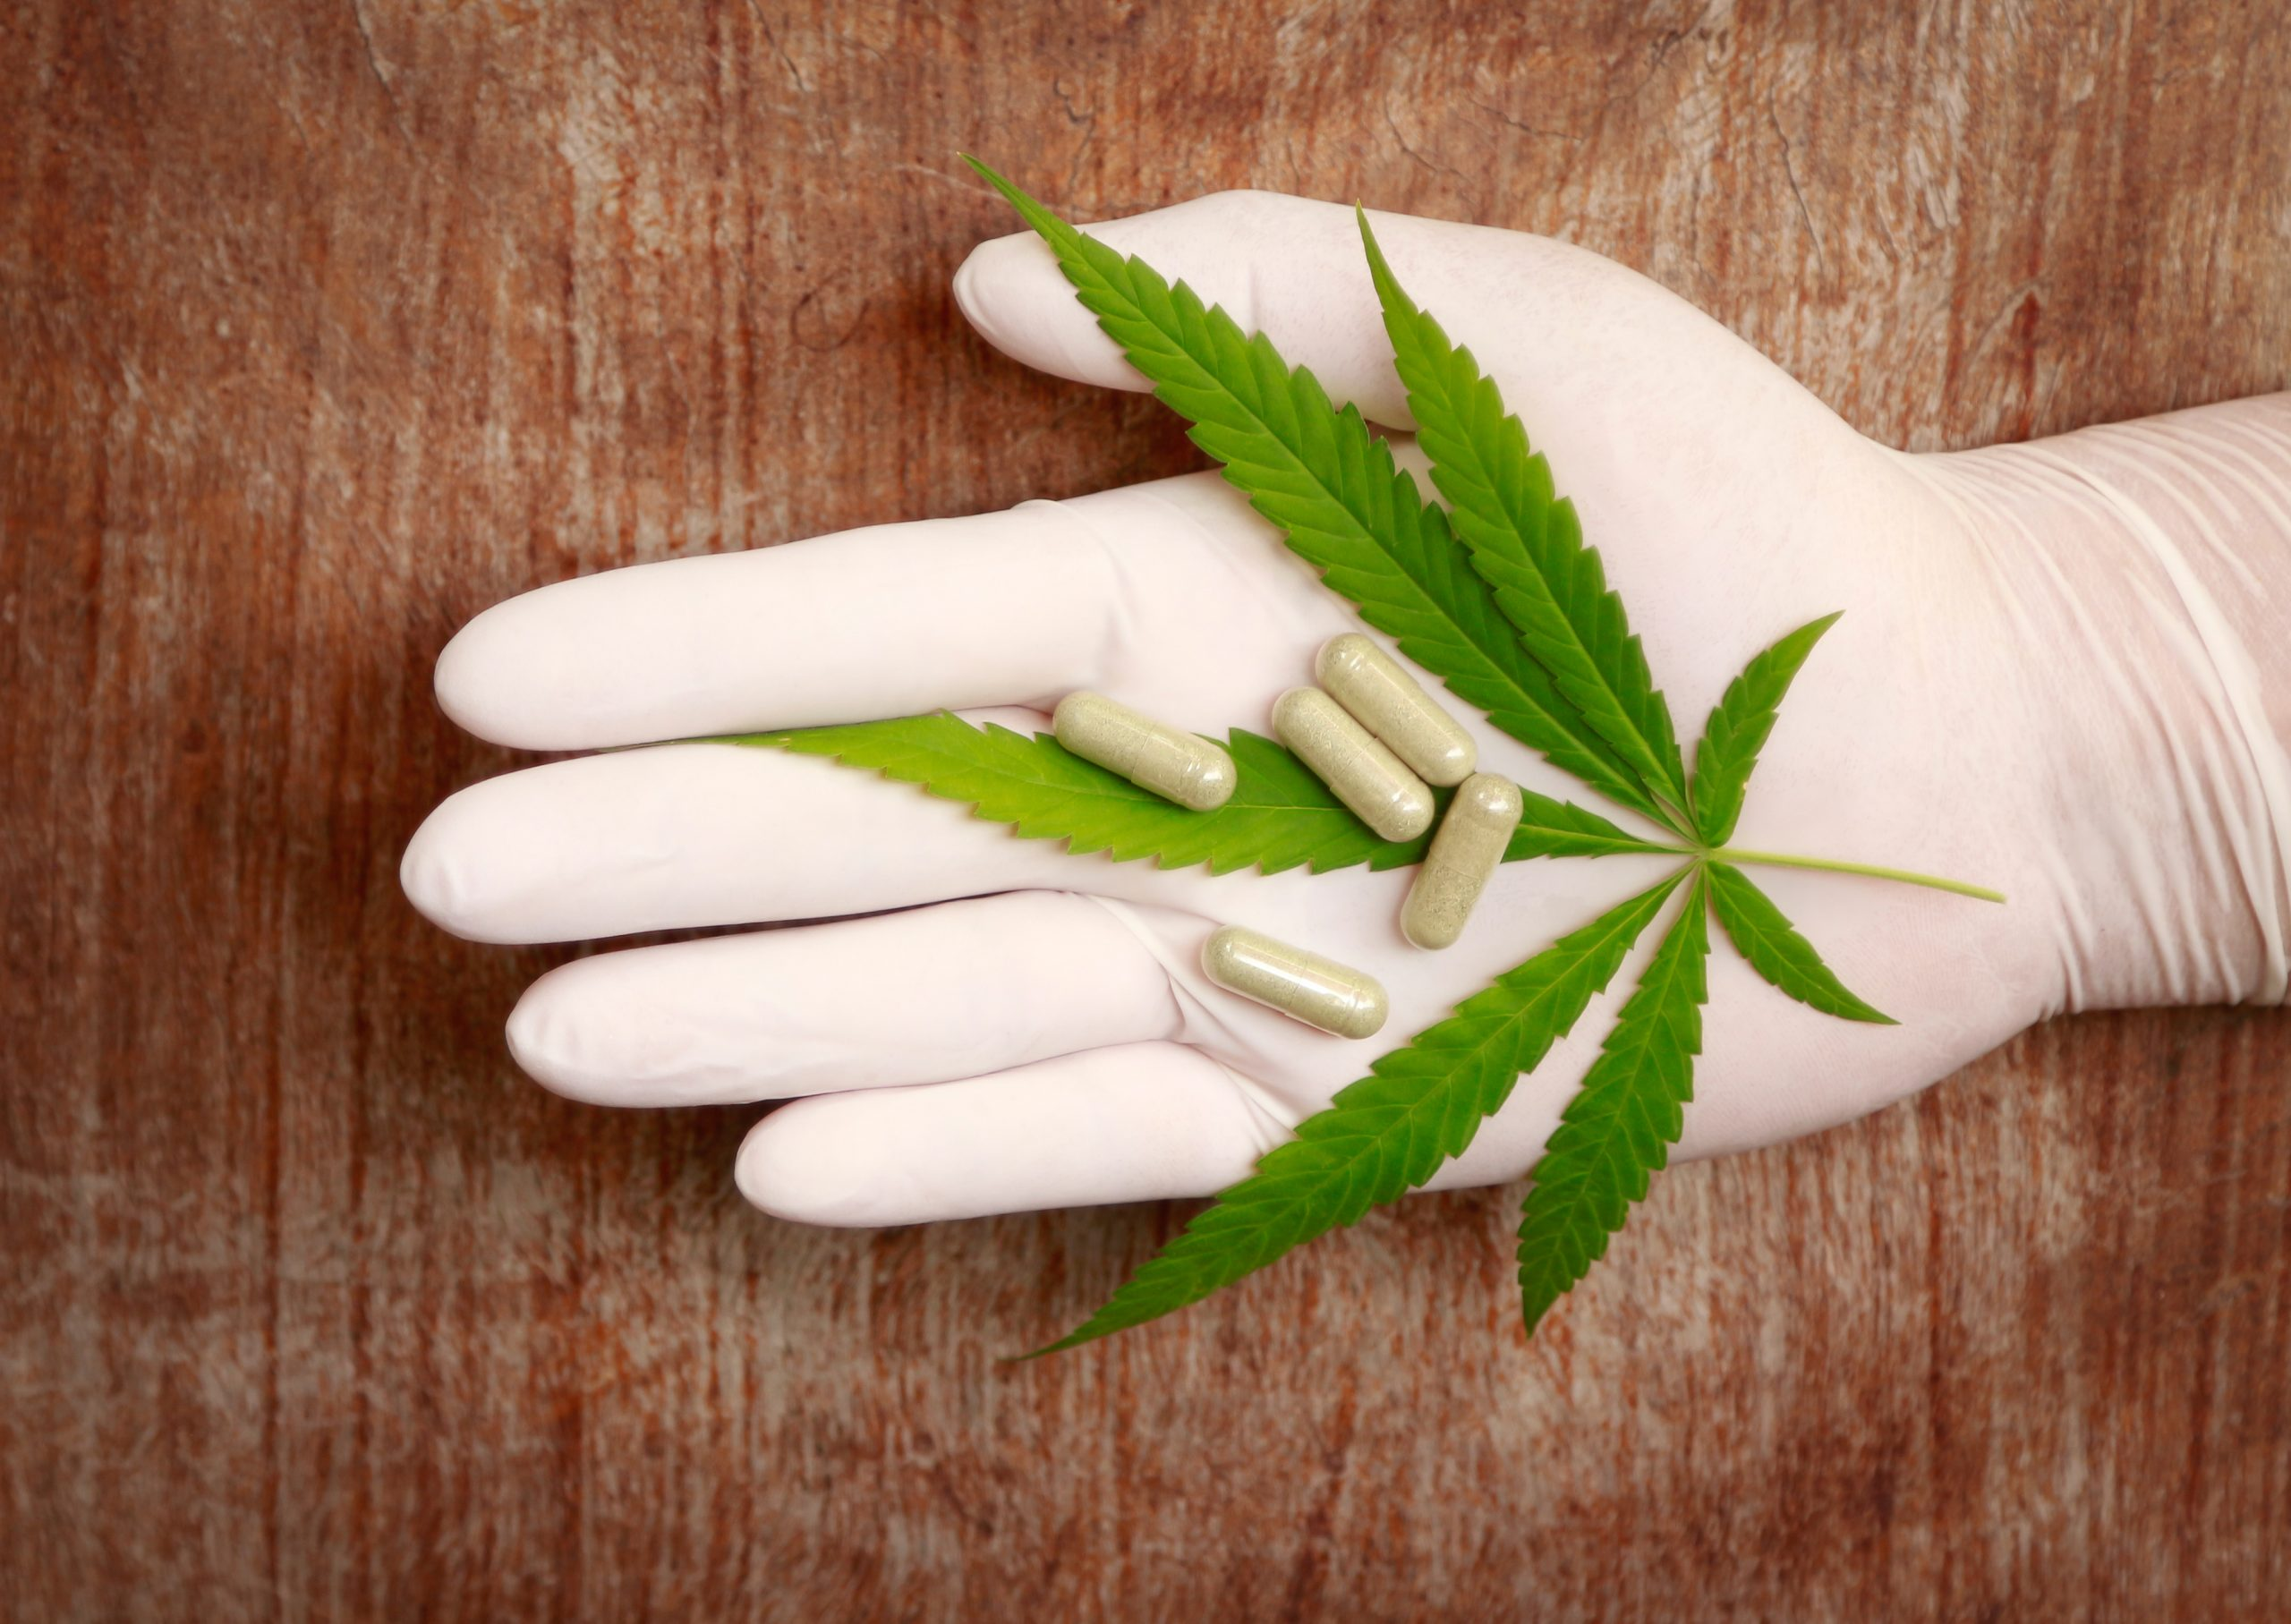 NACPT Preventive Control Plans For Cannabis